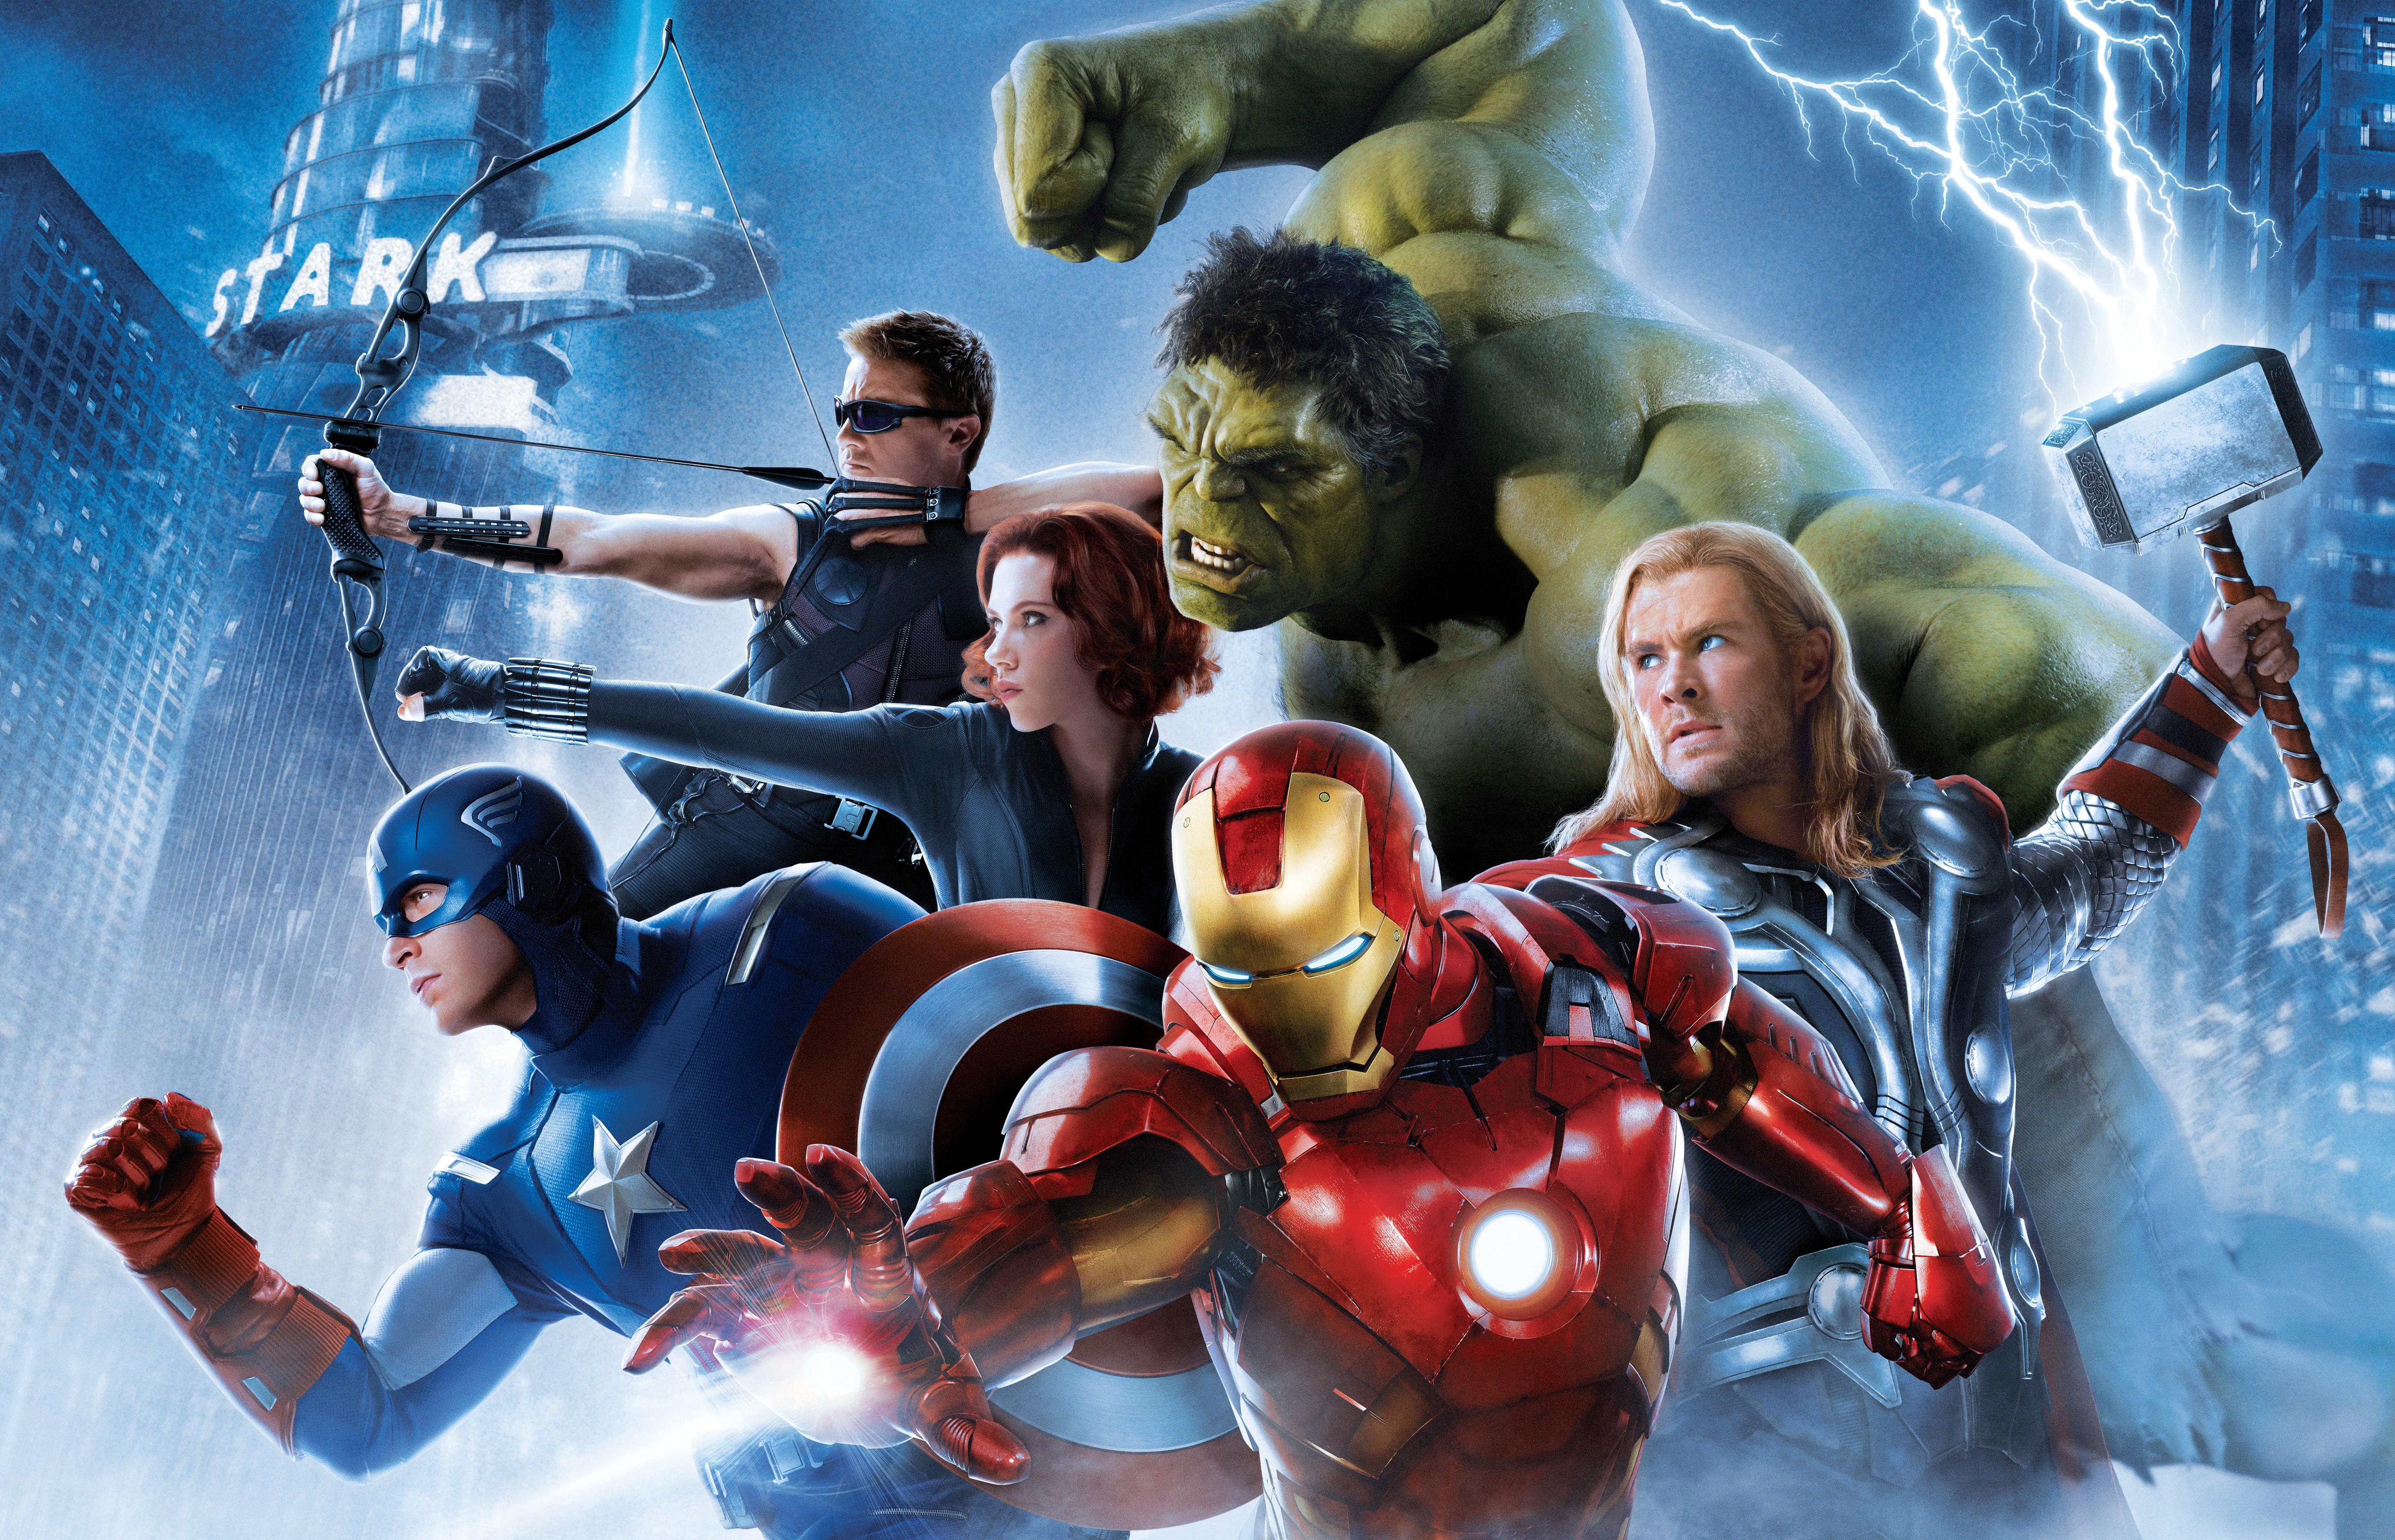 Lightning Scarlett Johansson Thor Iron Man Captain America